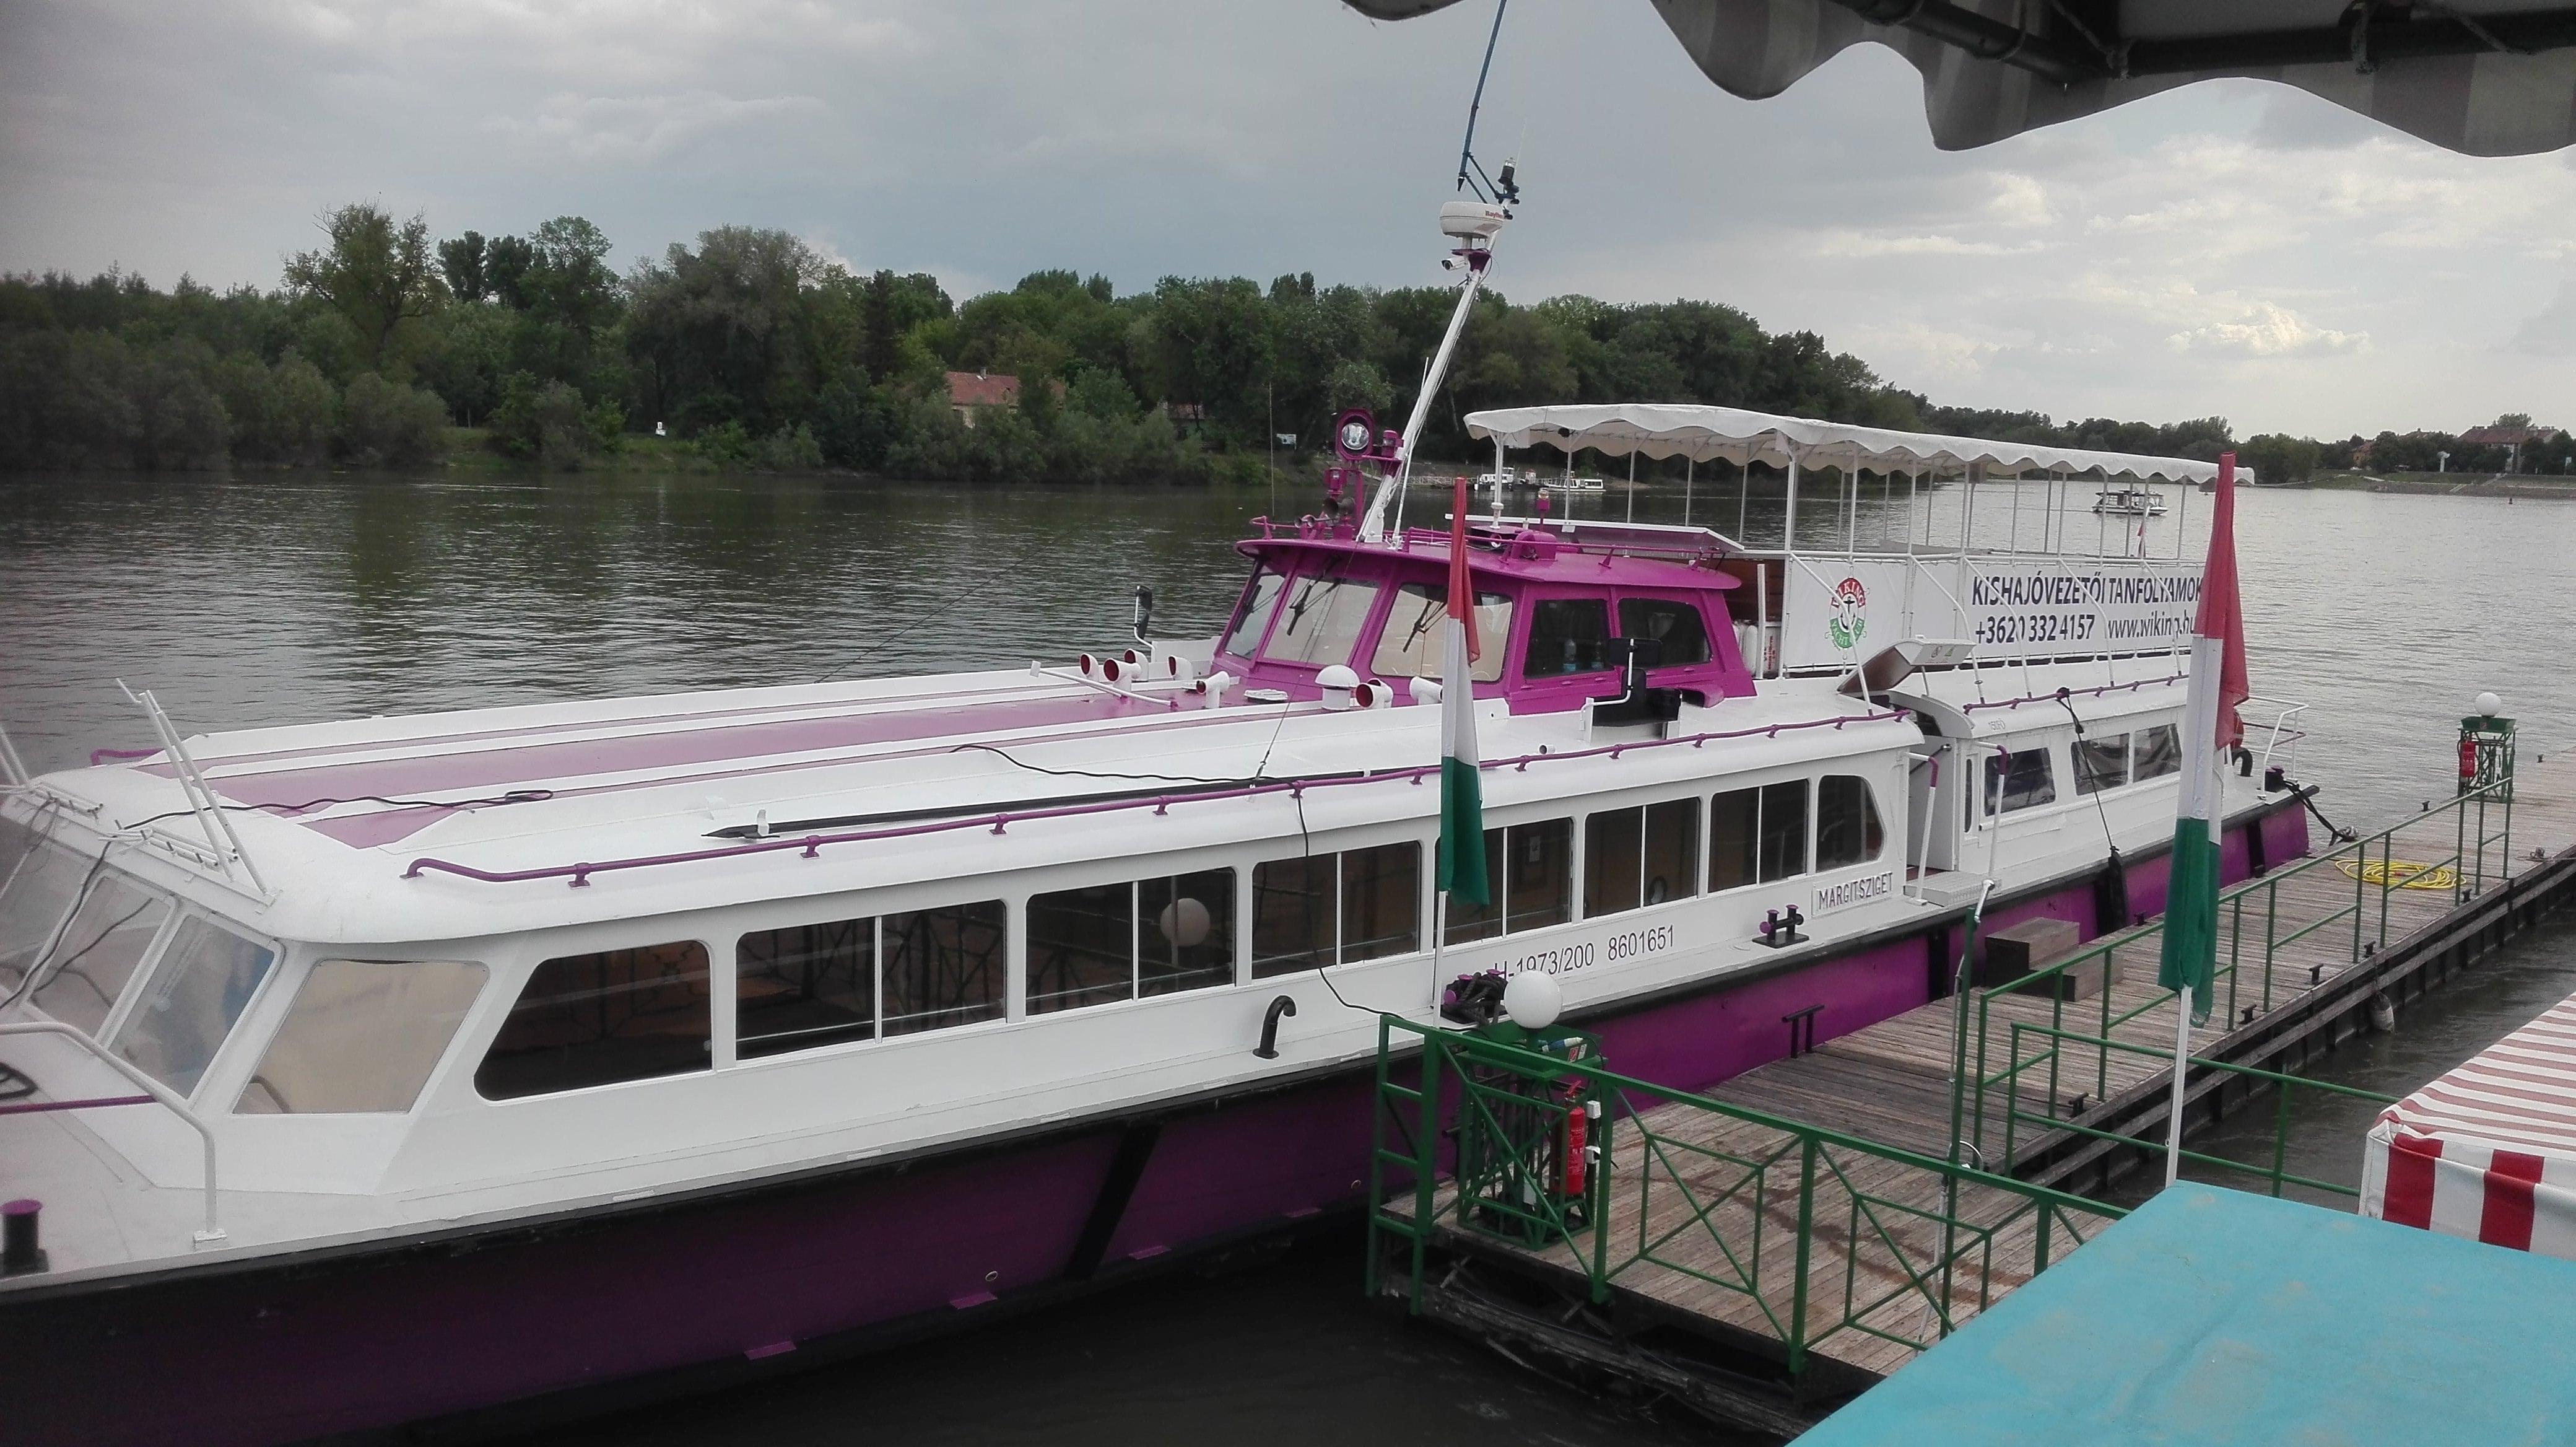 margitsziget private boat rental budapest